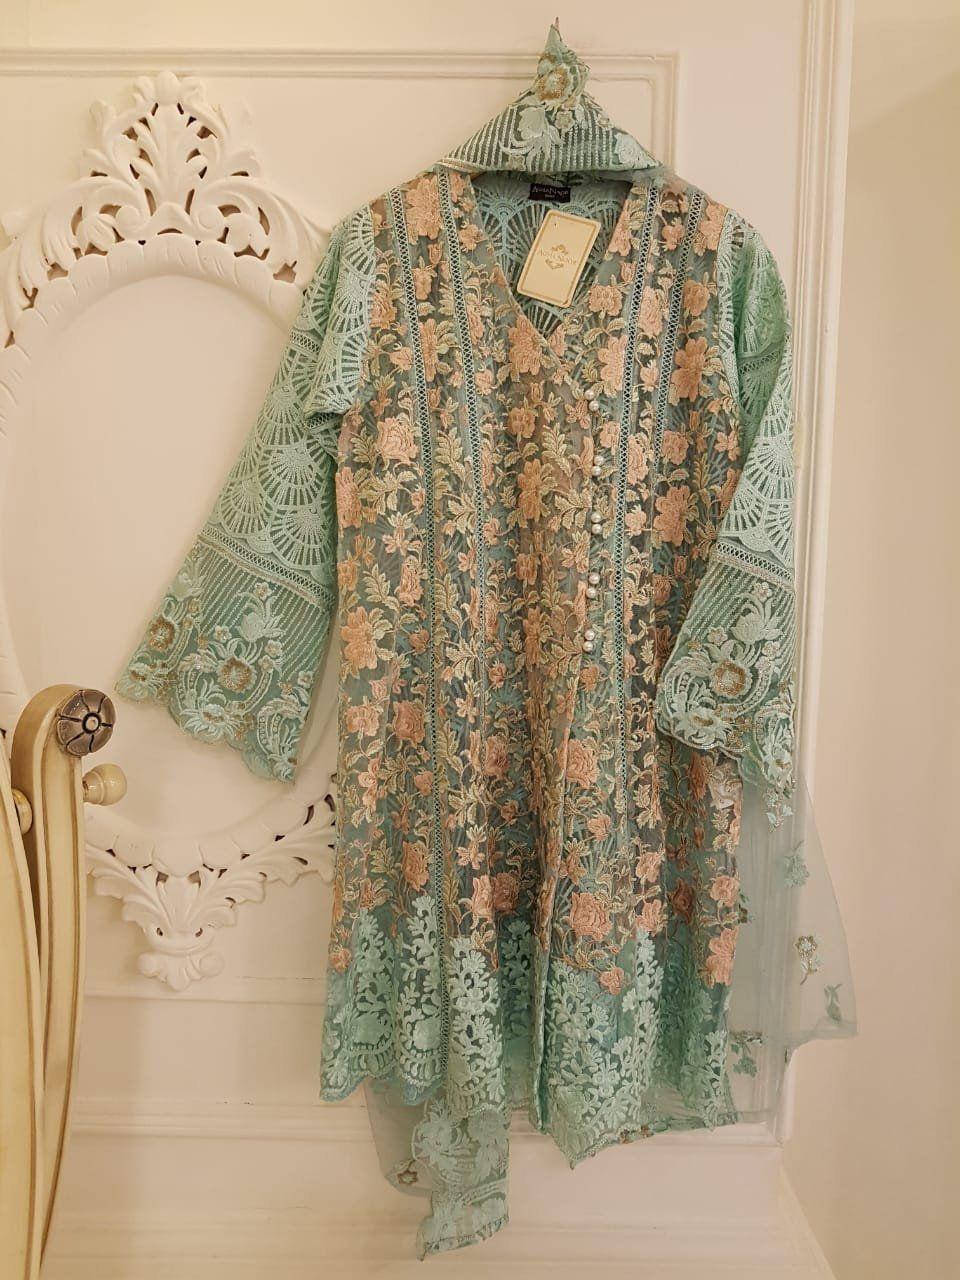 edeebd7972 Pure Chiffon Green Embroidered 3 piece suit, Agha Noor Kurti, Pakistani  Dress, Indian Dress, Bollywood dress by MyChandBali on Etsy